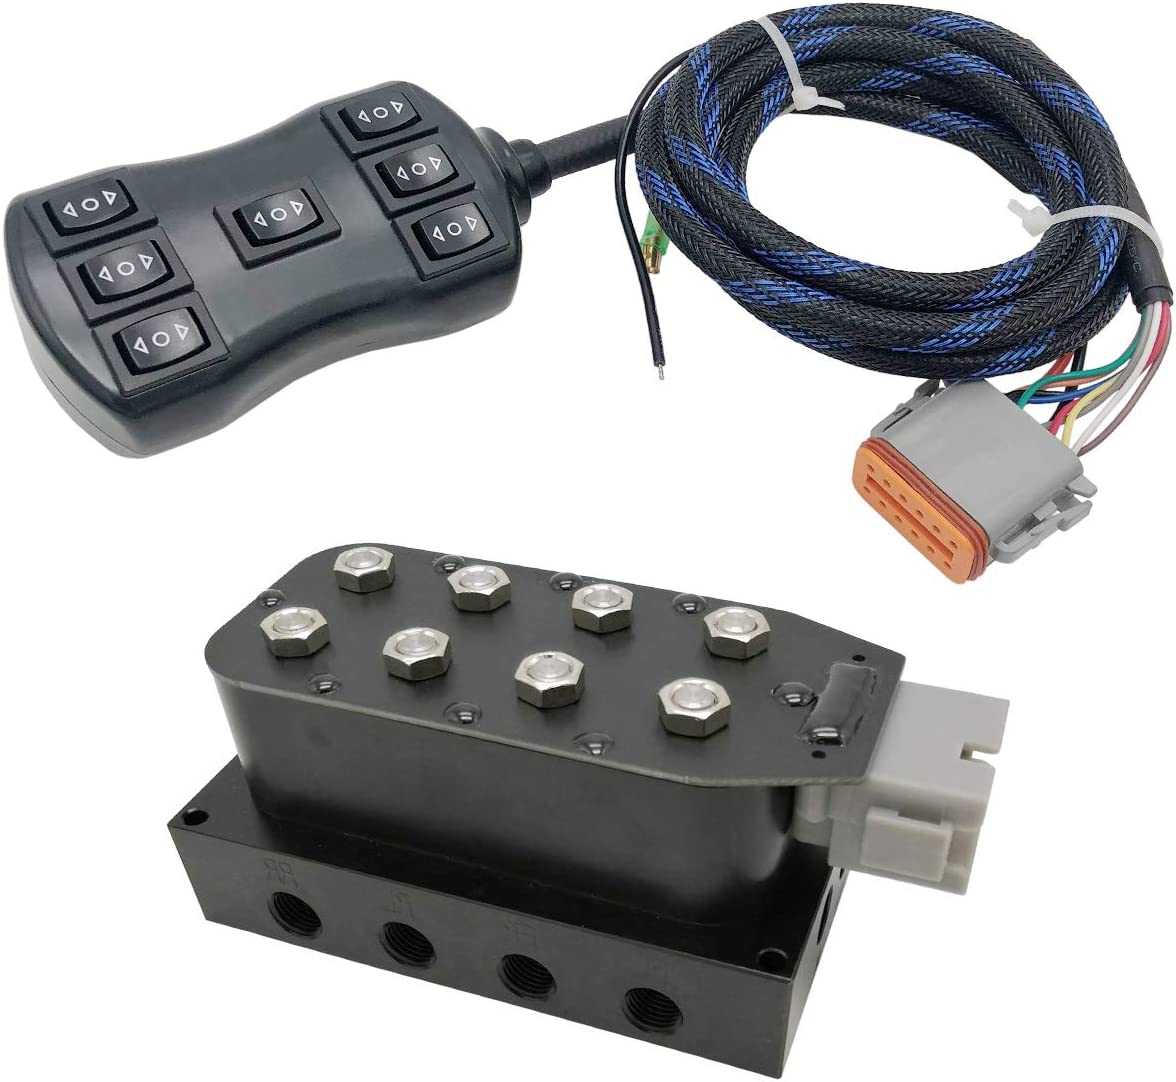 VEVOR Air Suspension Valve 3//8 NPT VU4 Solenoid Valve Manifold Air Suspension with Control Wiring Harness